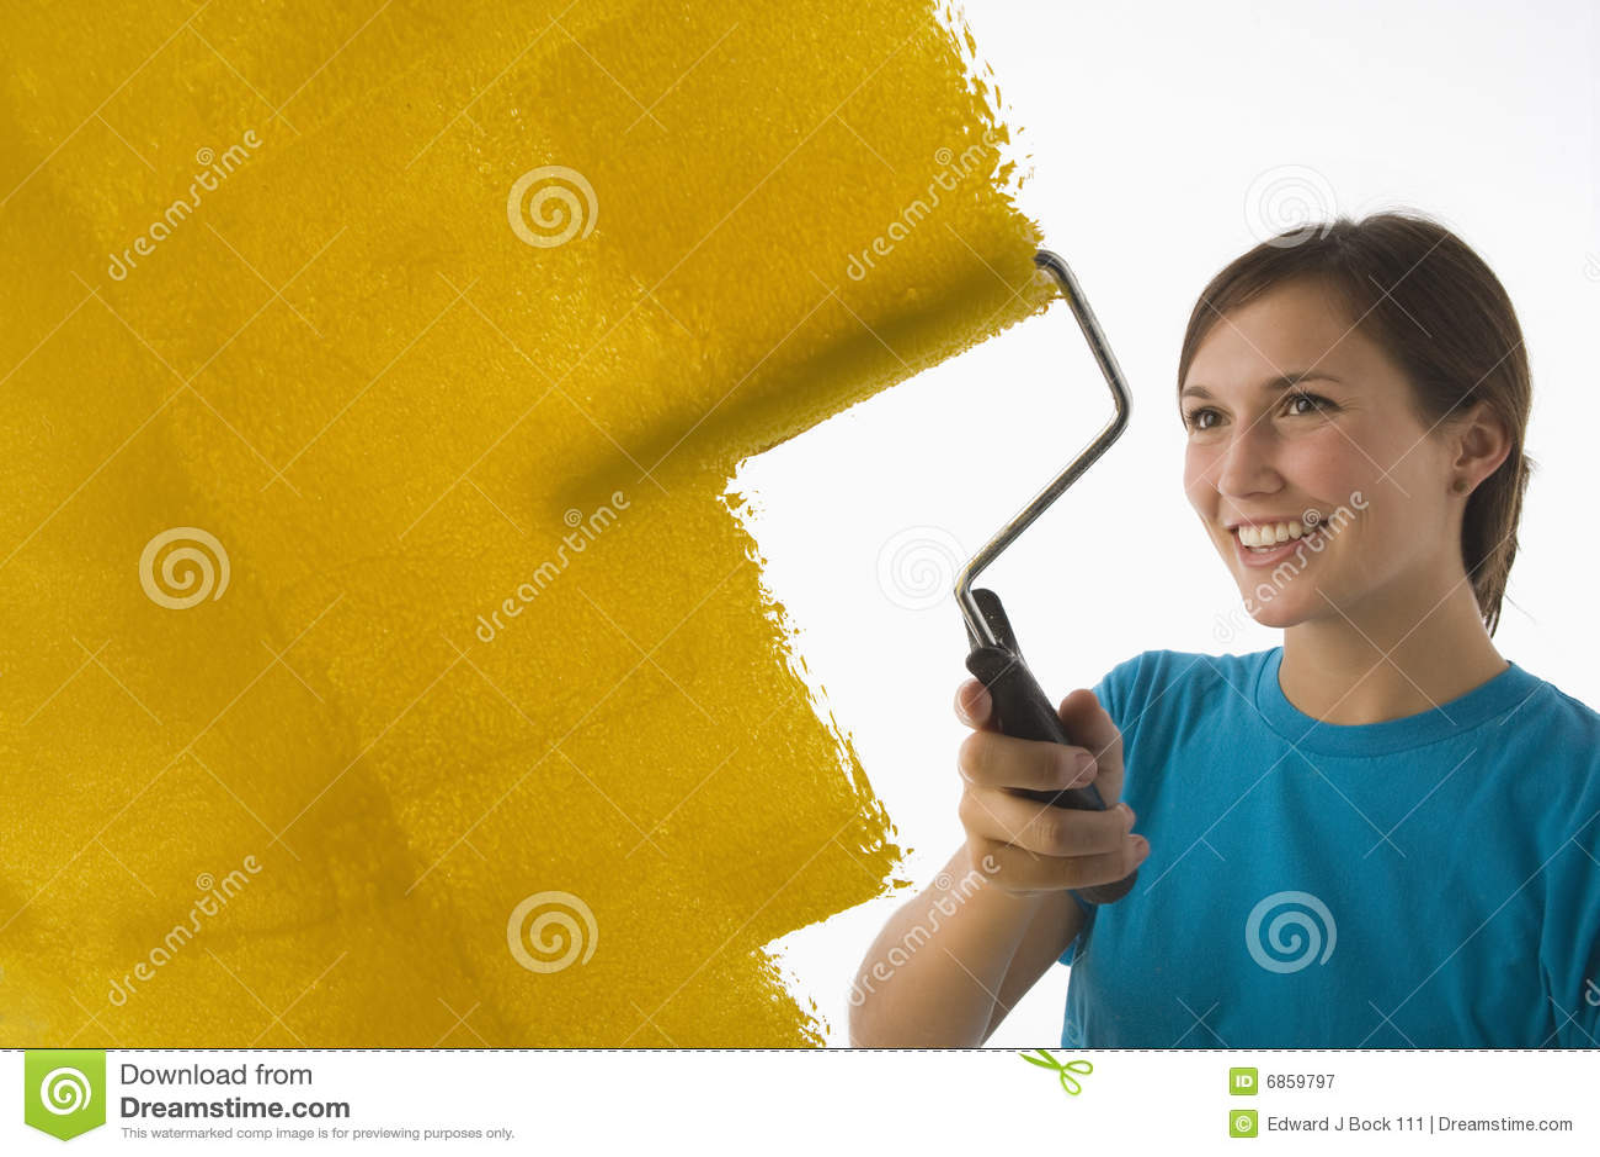 Young woman painting walls